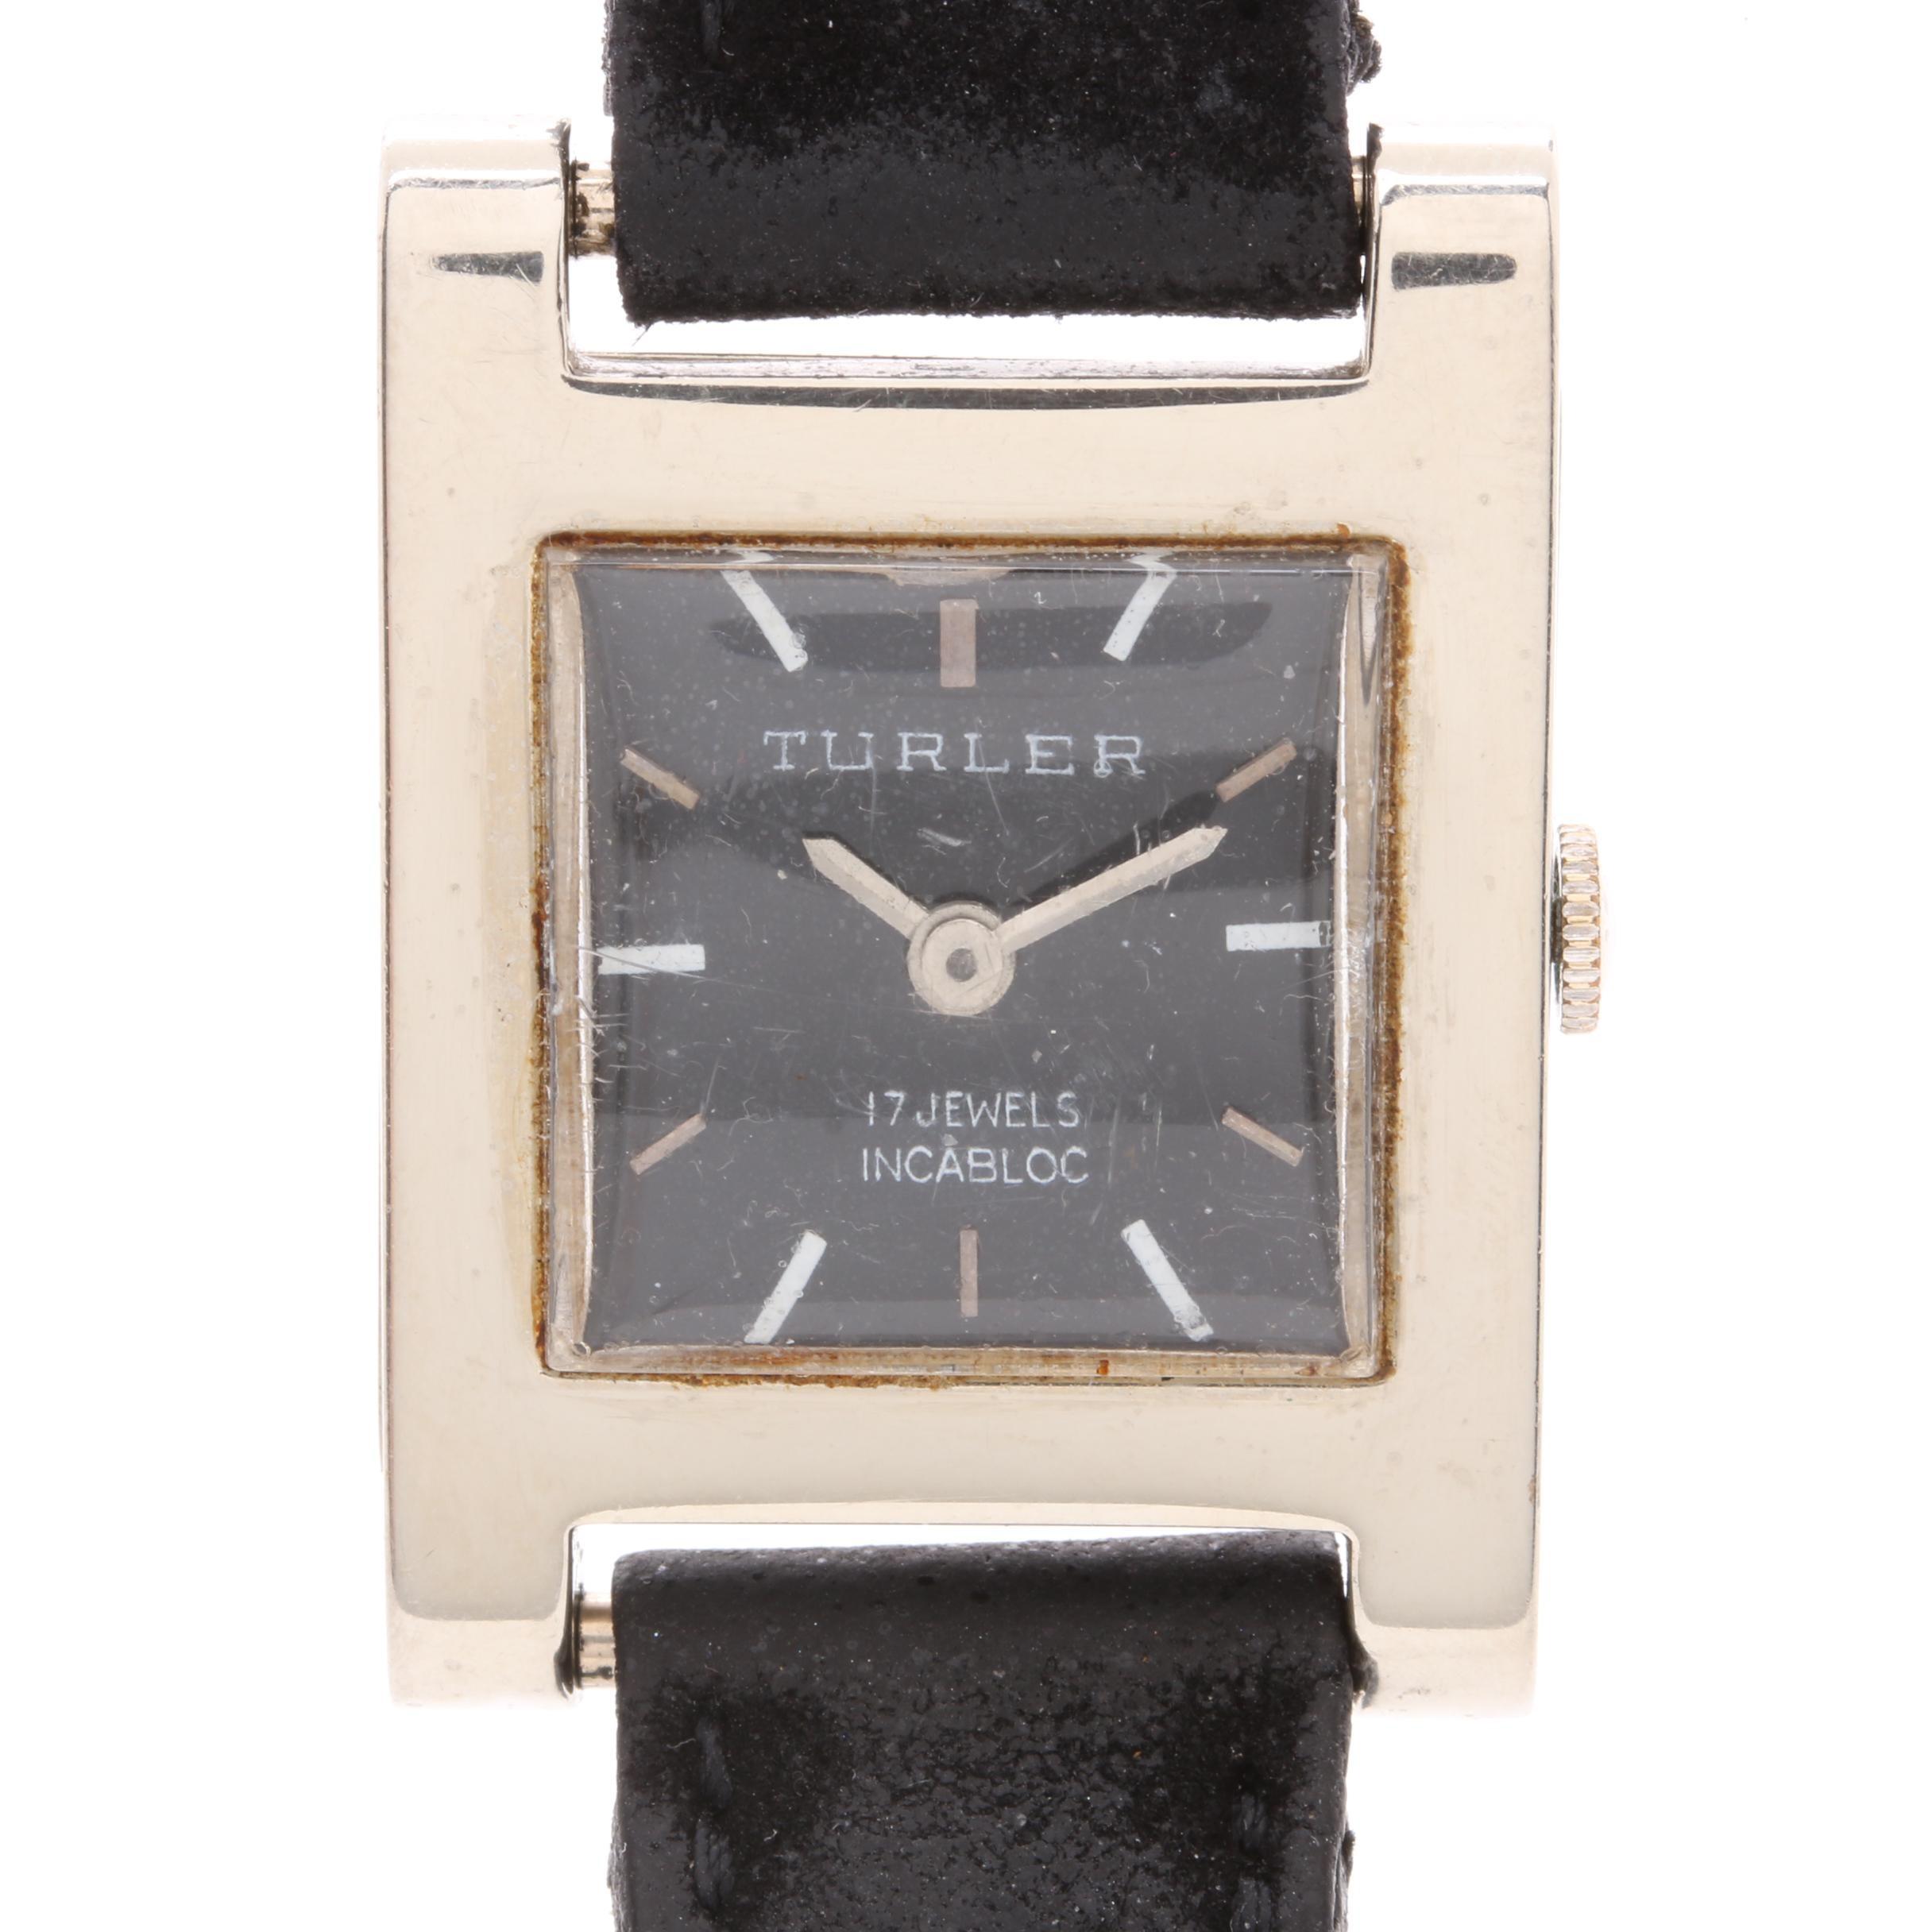 18K White Gold Turler Wristwatch